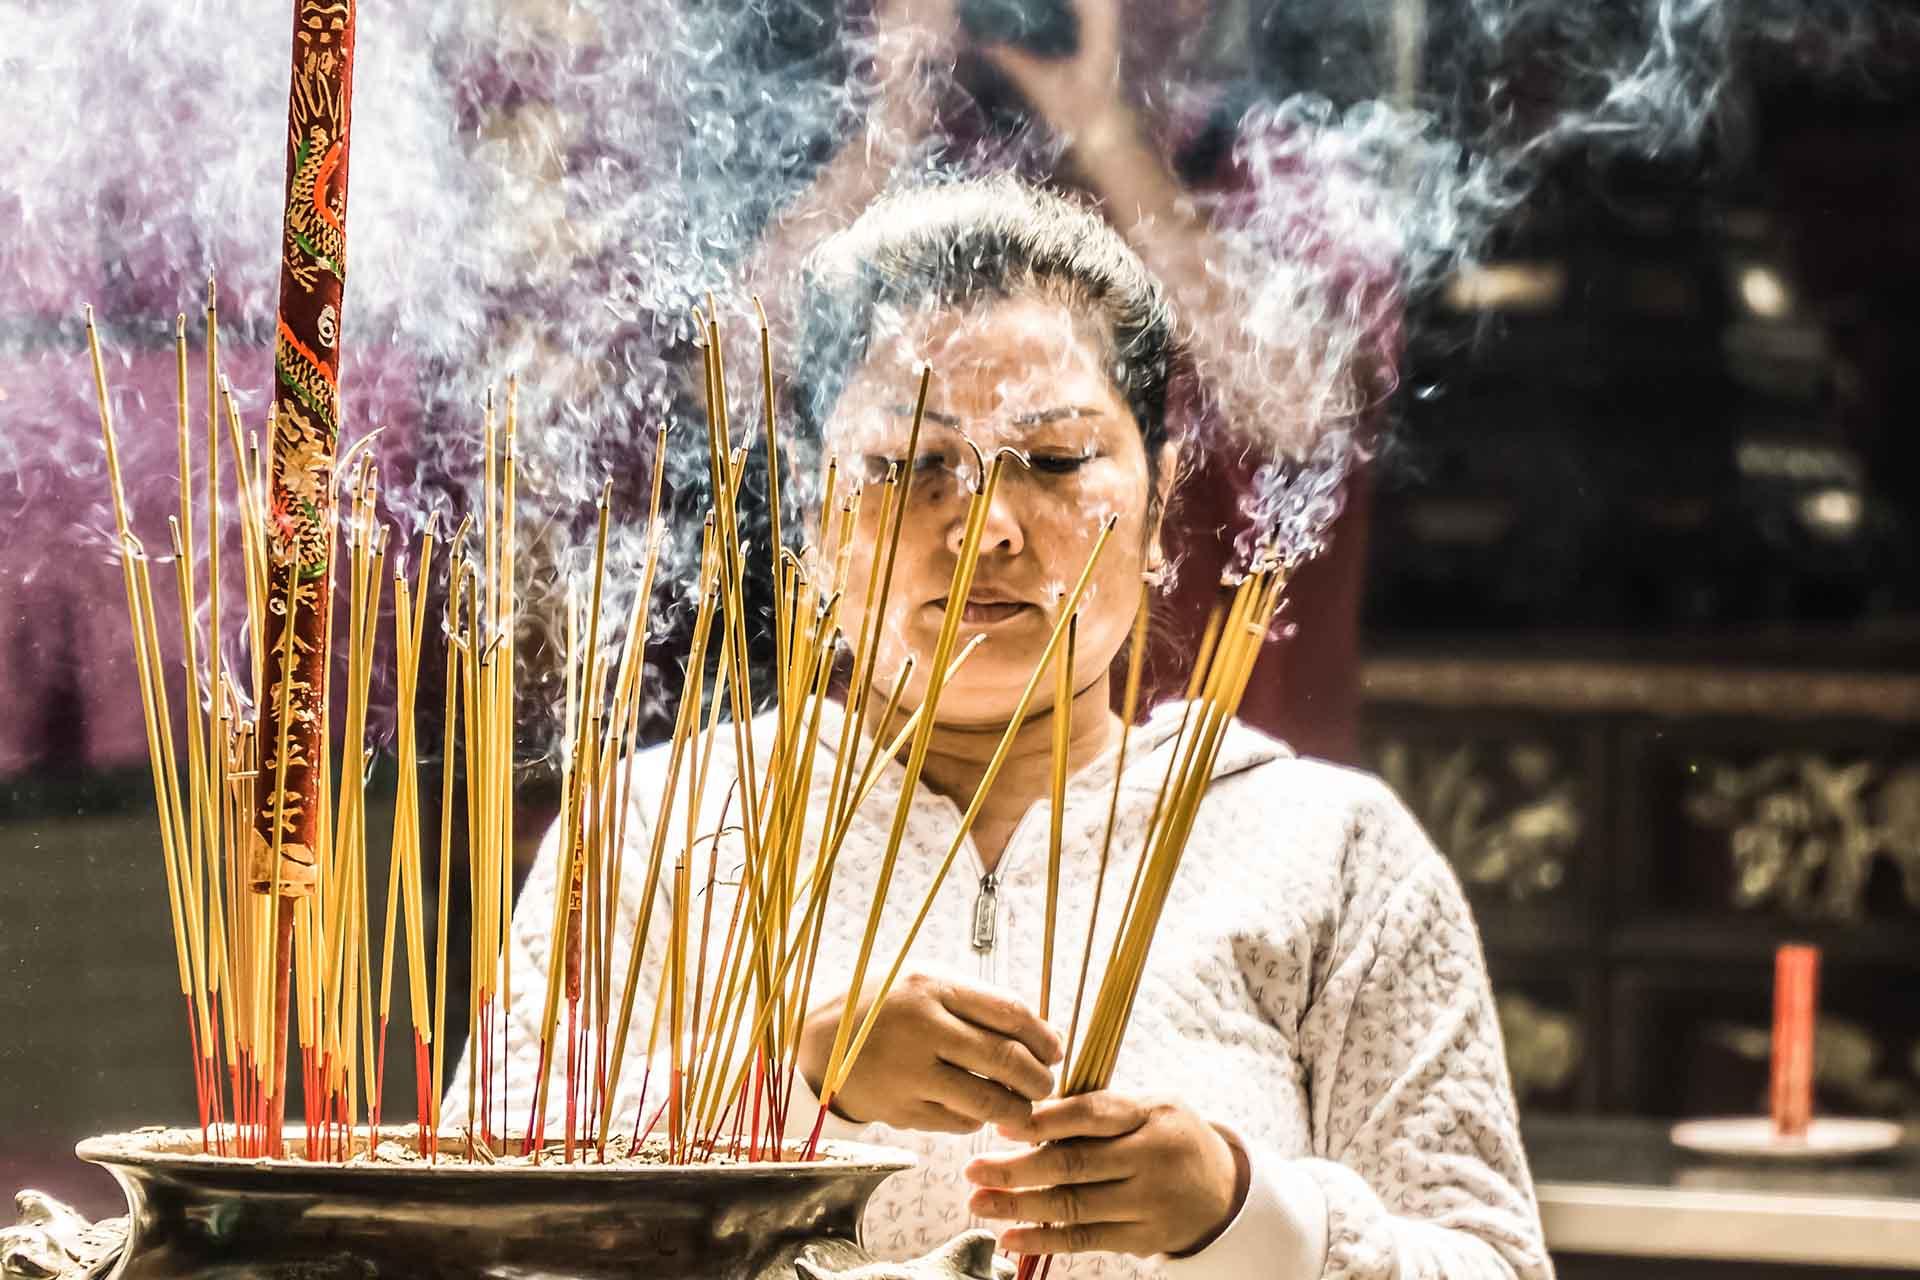 Medicina Tradizionale Cinese in occidente OMS GEOPOLITICA QI KI